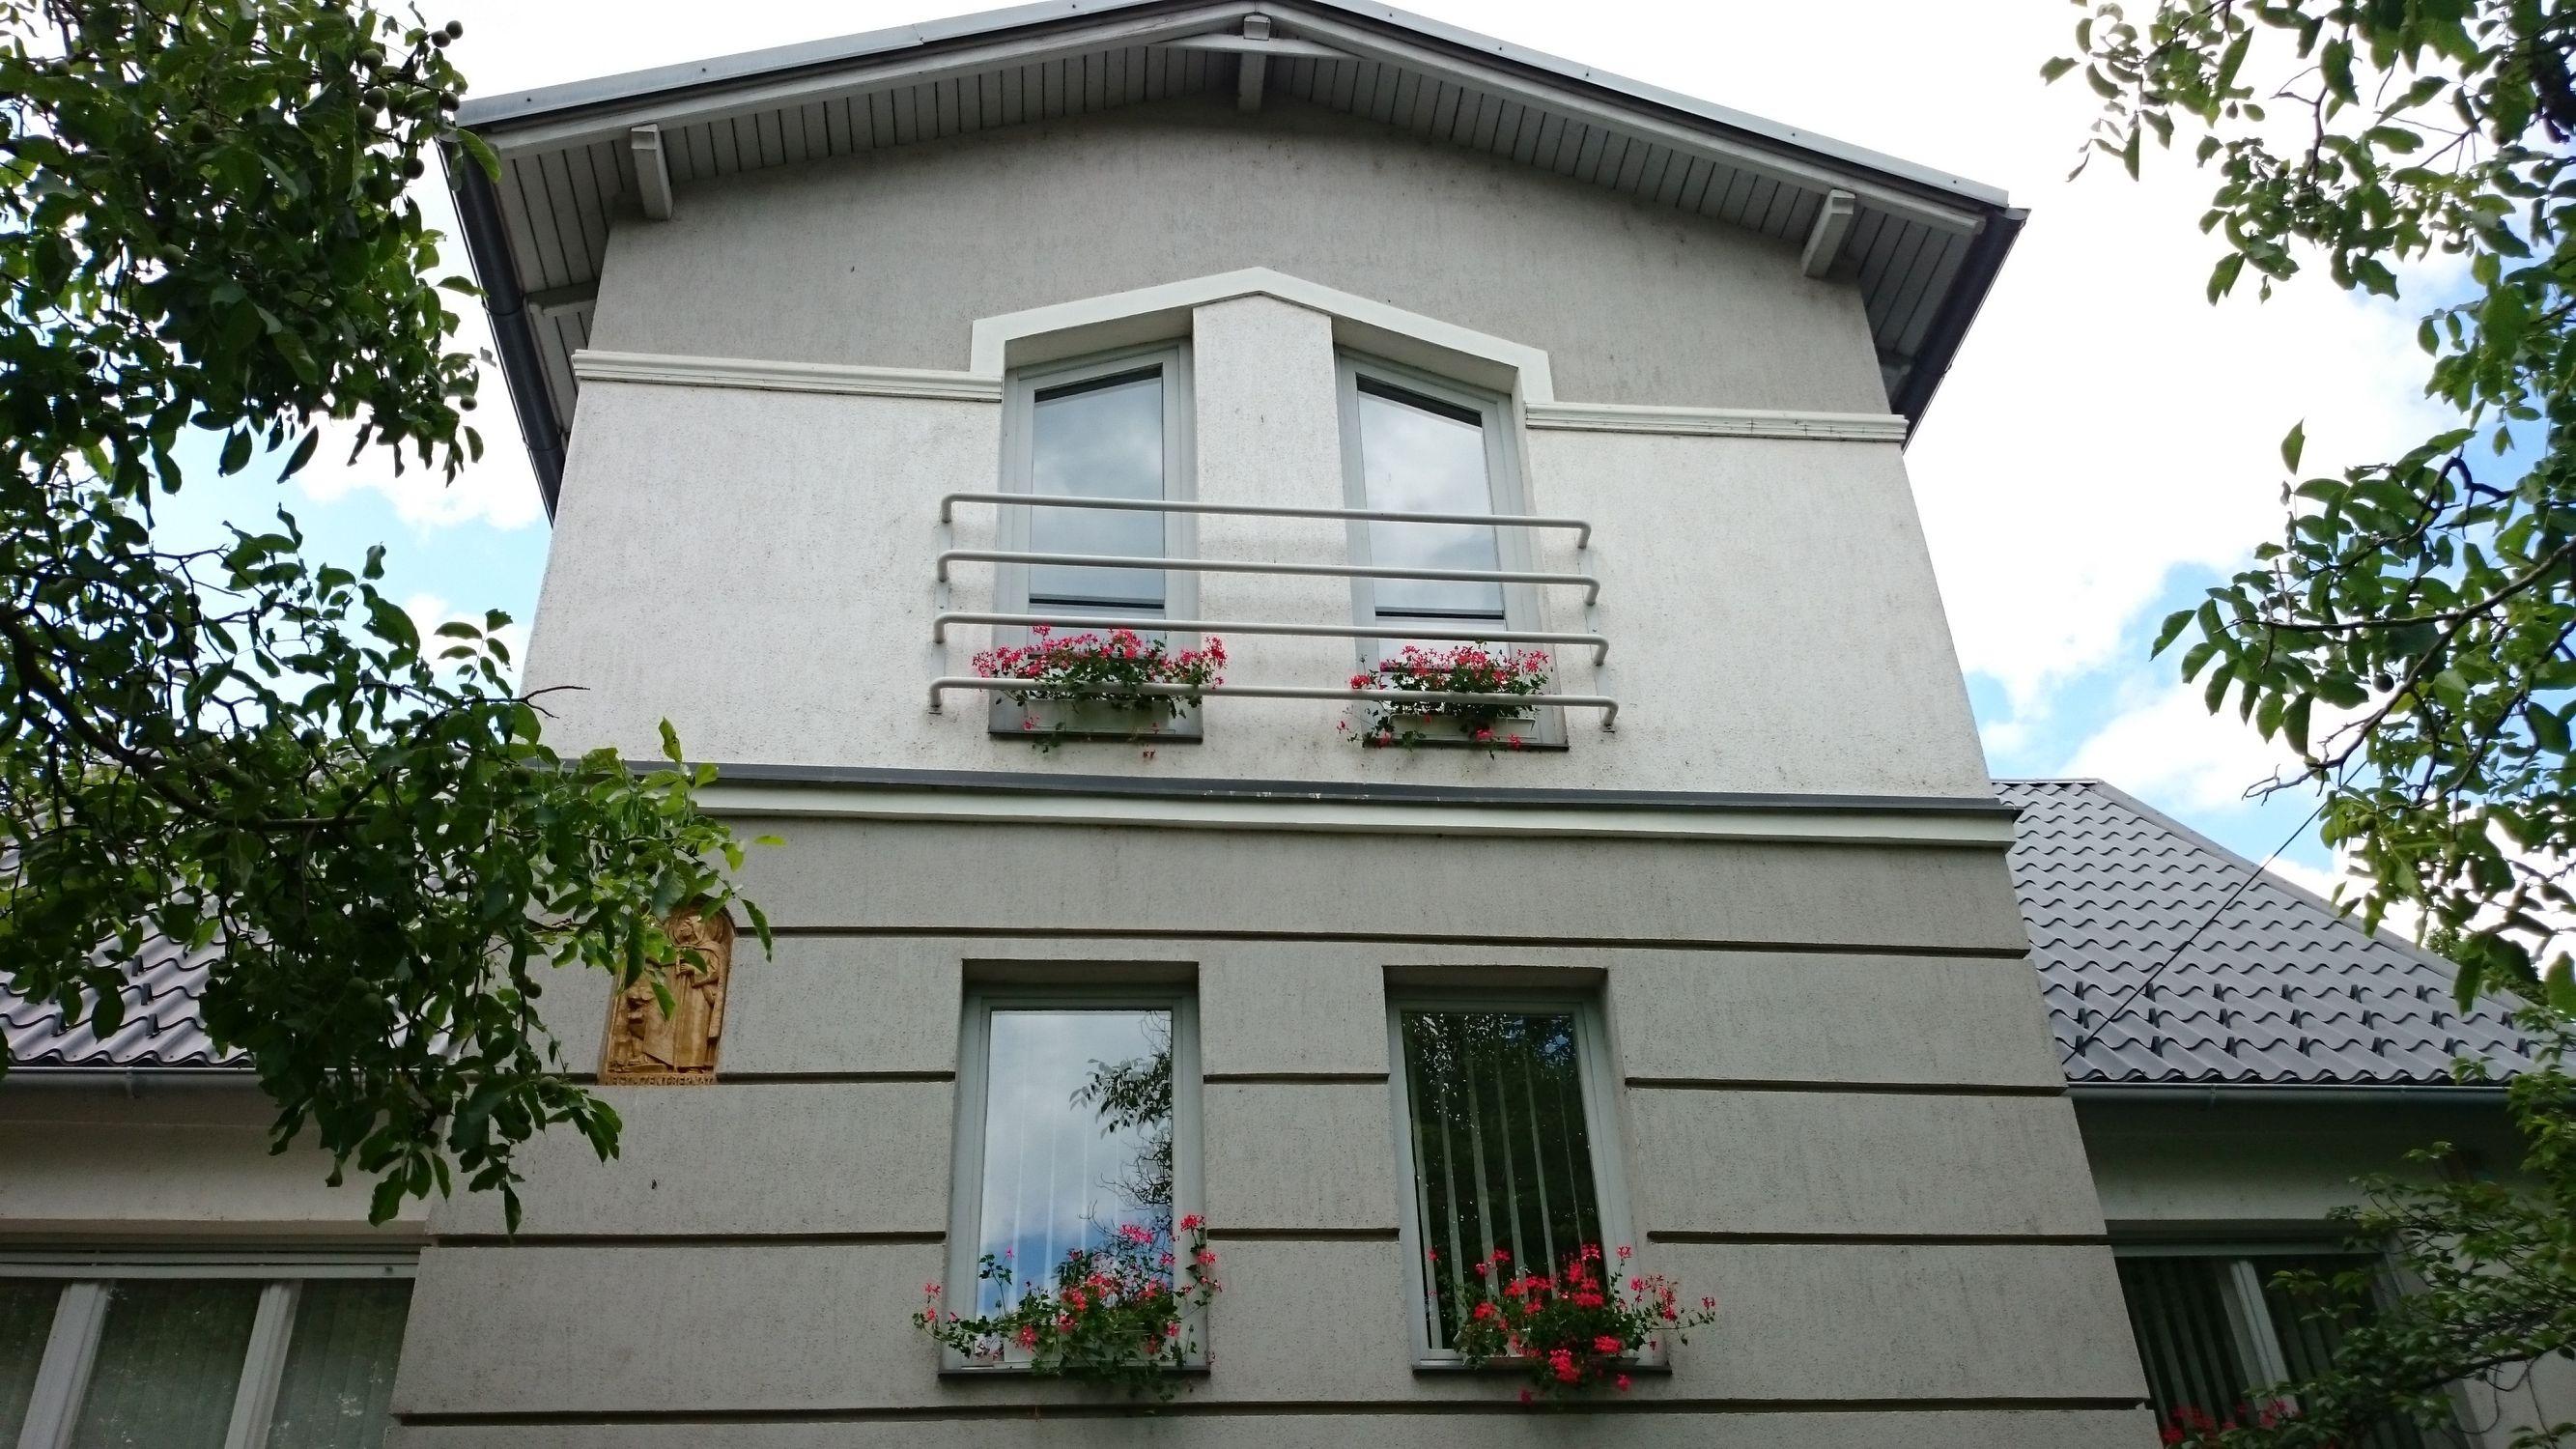 Villa Valéria Balatonfüred Ház homlokzata